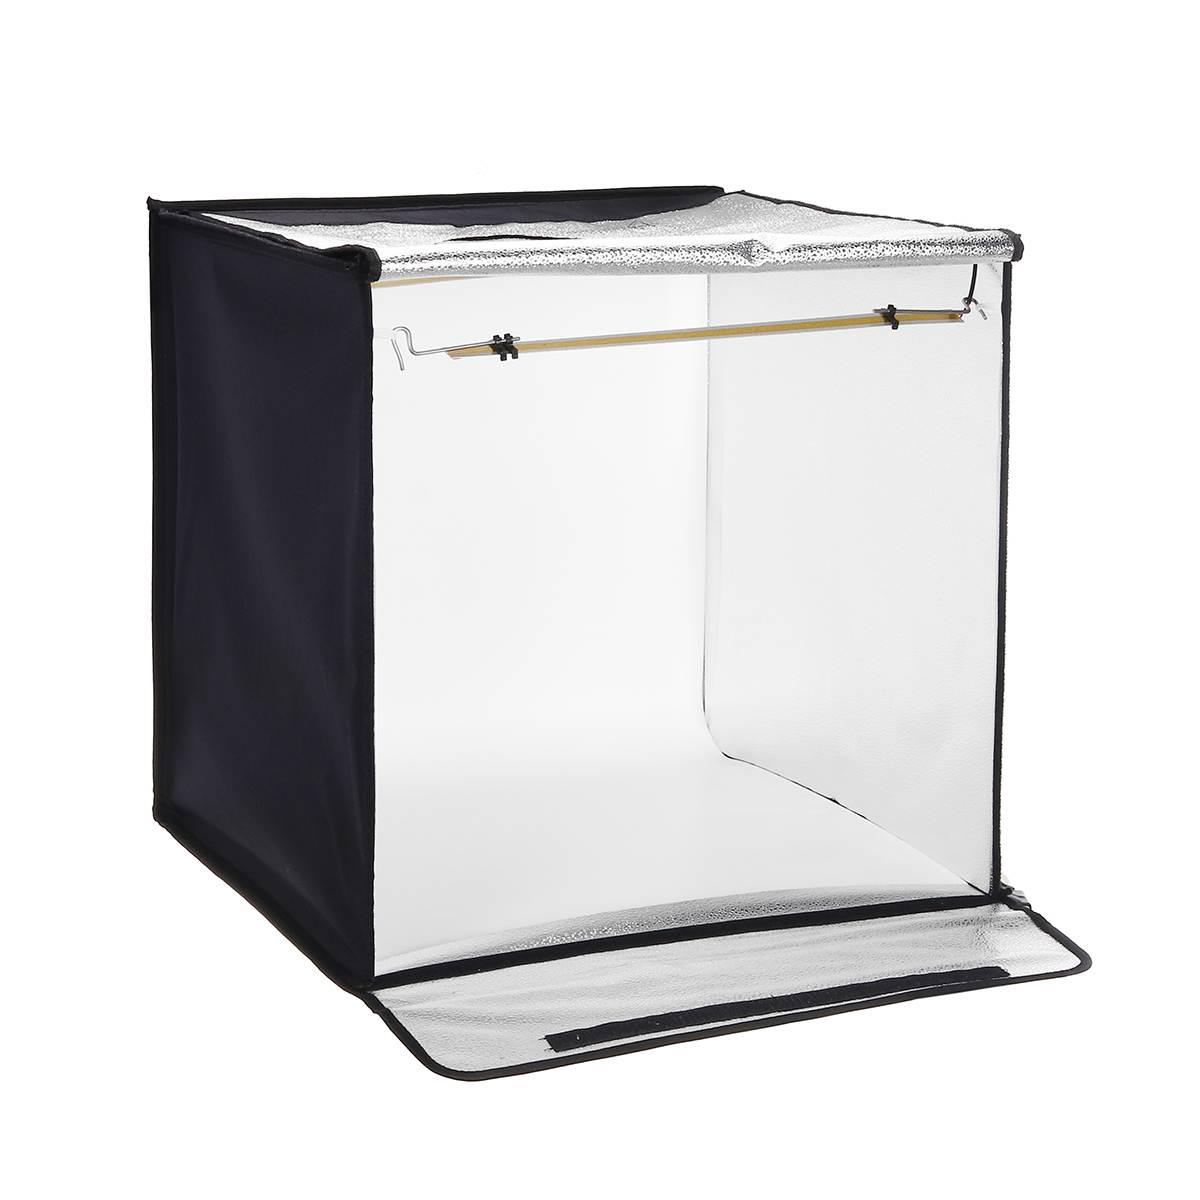 60*60cm 24 polegadas portátil mini photo studio box led softbox 46 w 5000 k luz branca iluminação foto estúdio tiro tenda caixa kit